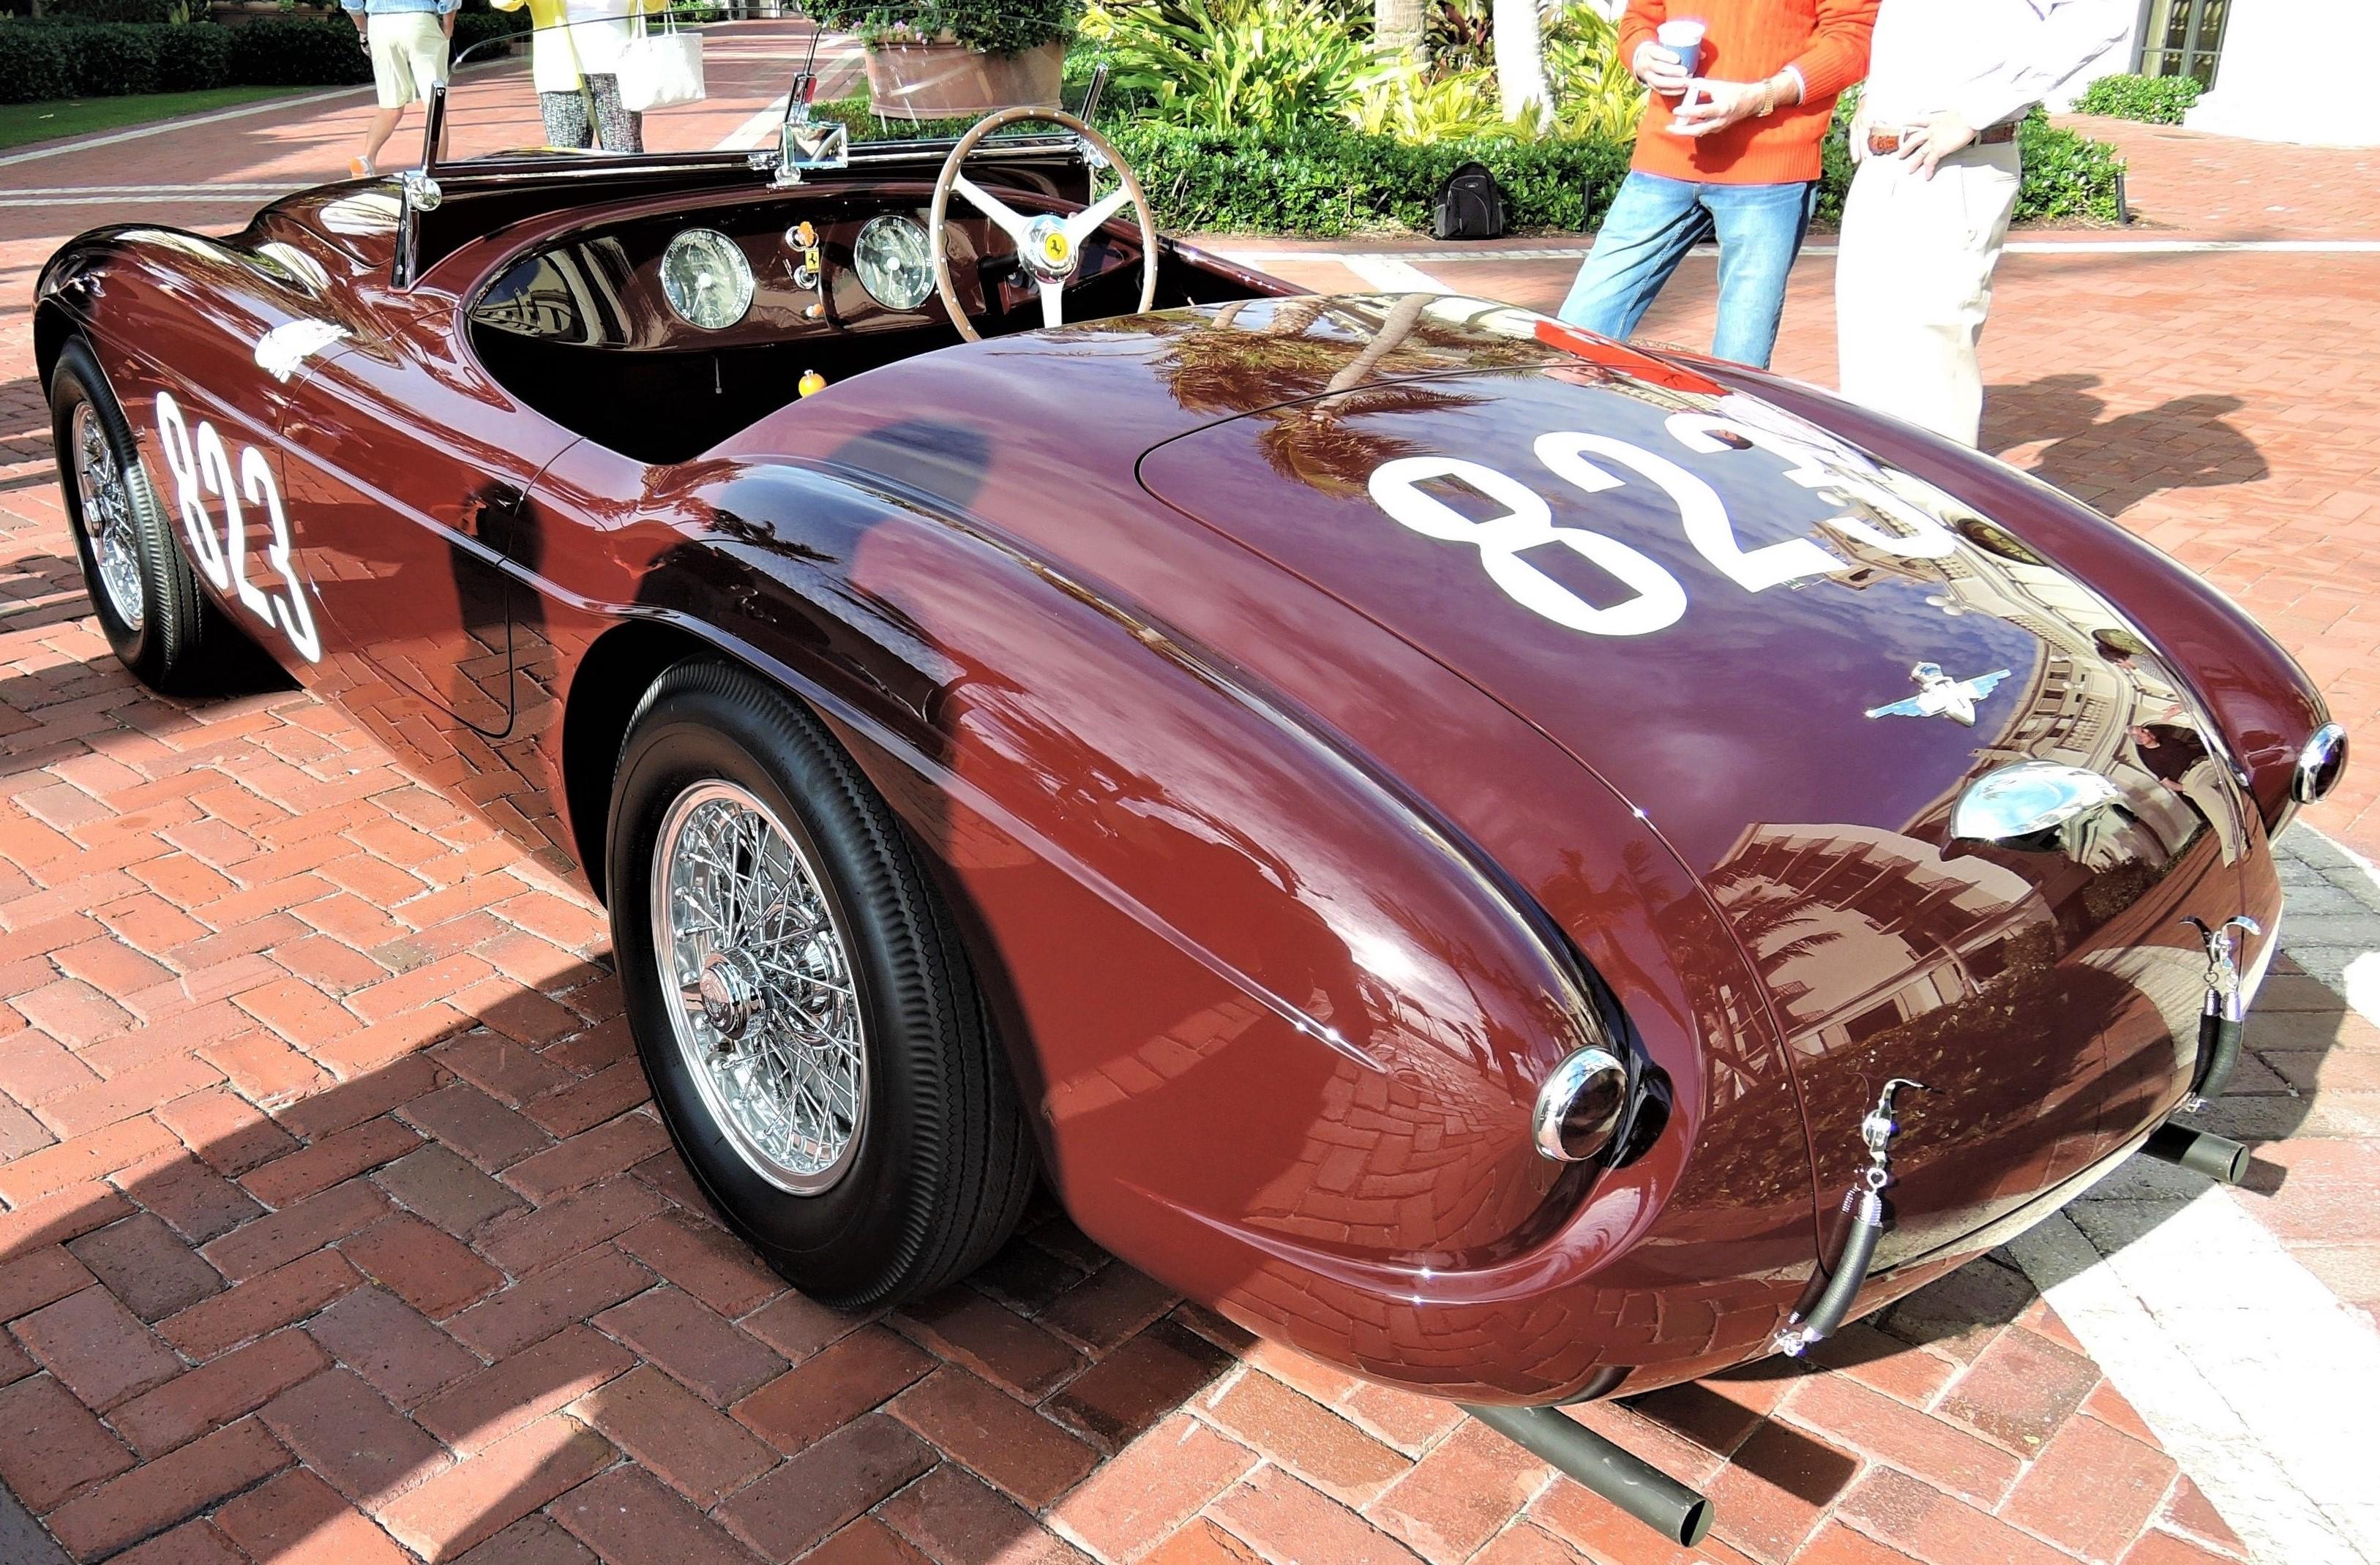 1951 Ferrari 212 Export Touring Barchetta; Sn 0102 E - cavallino 2018